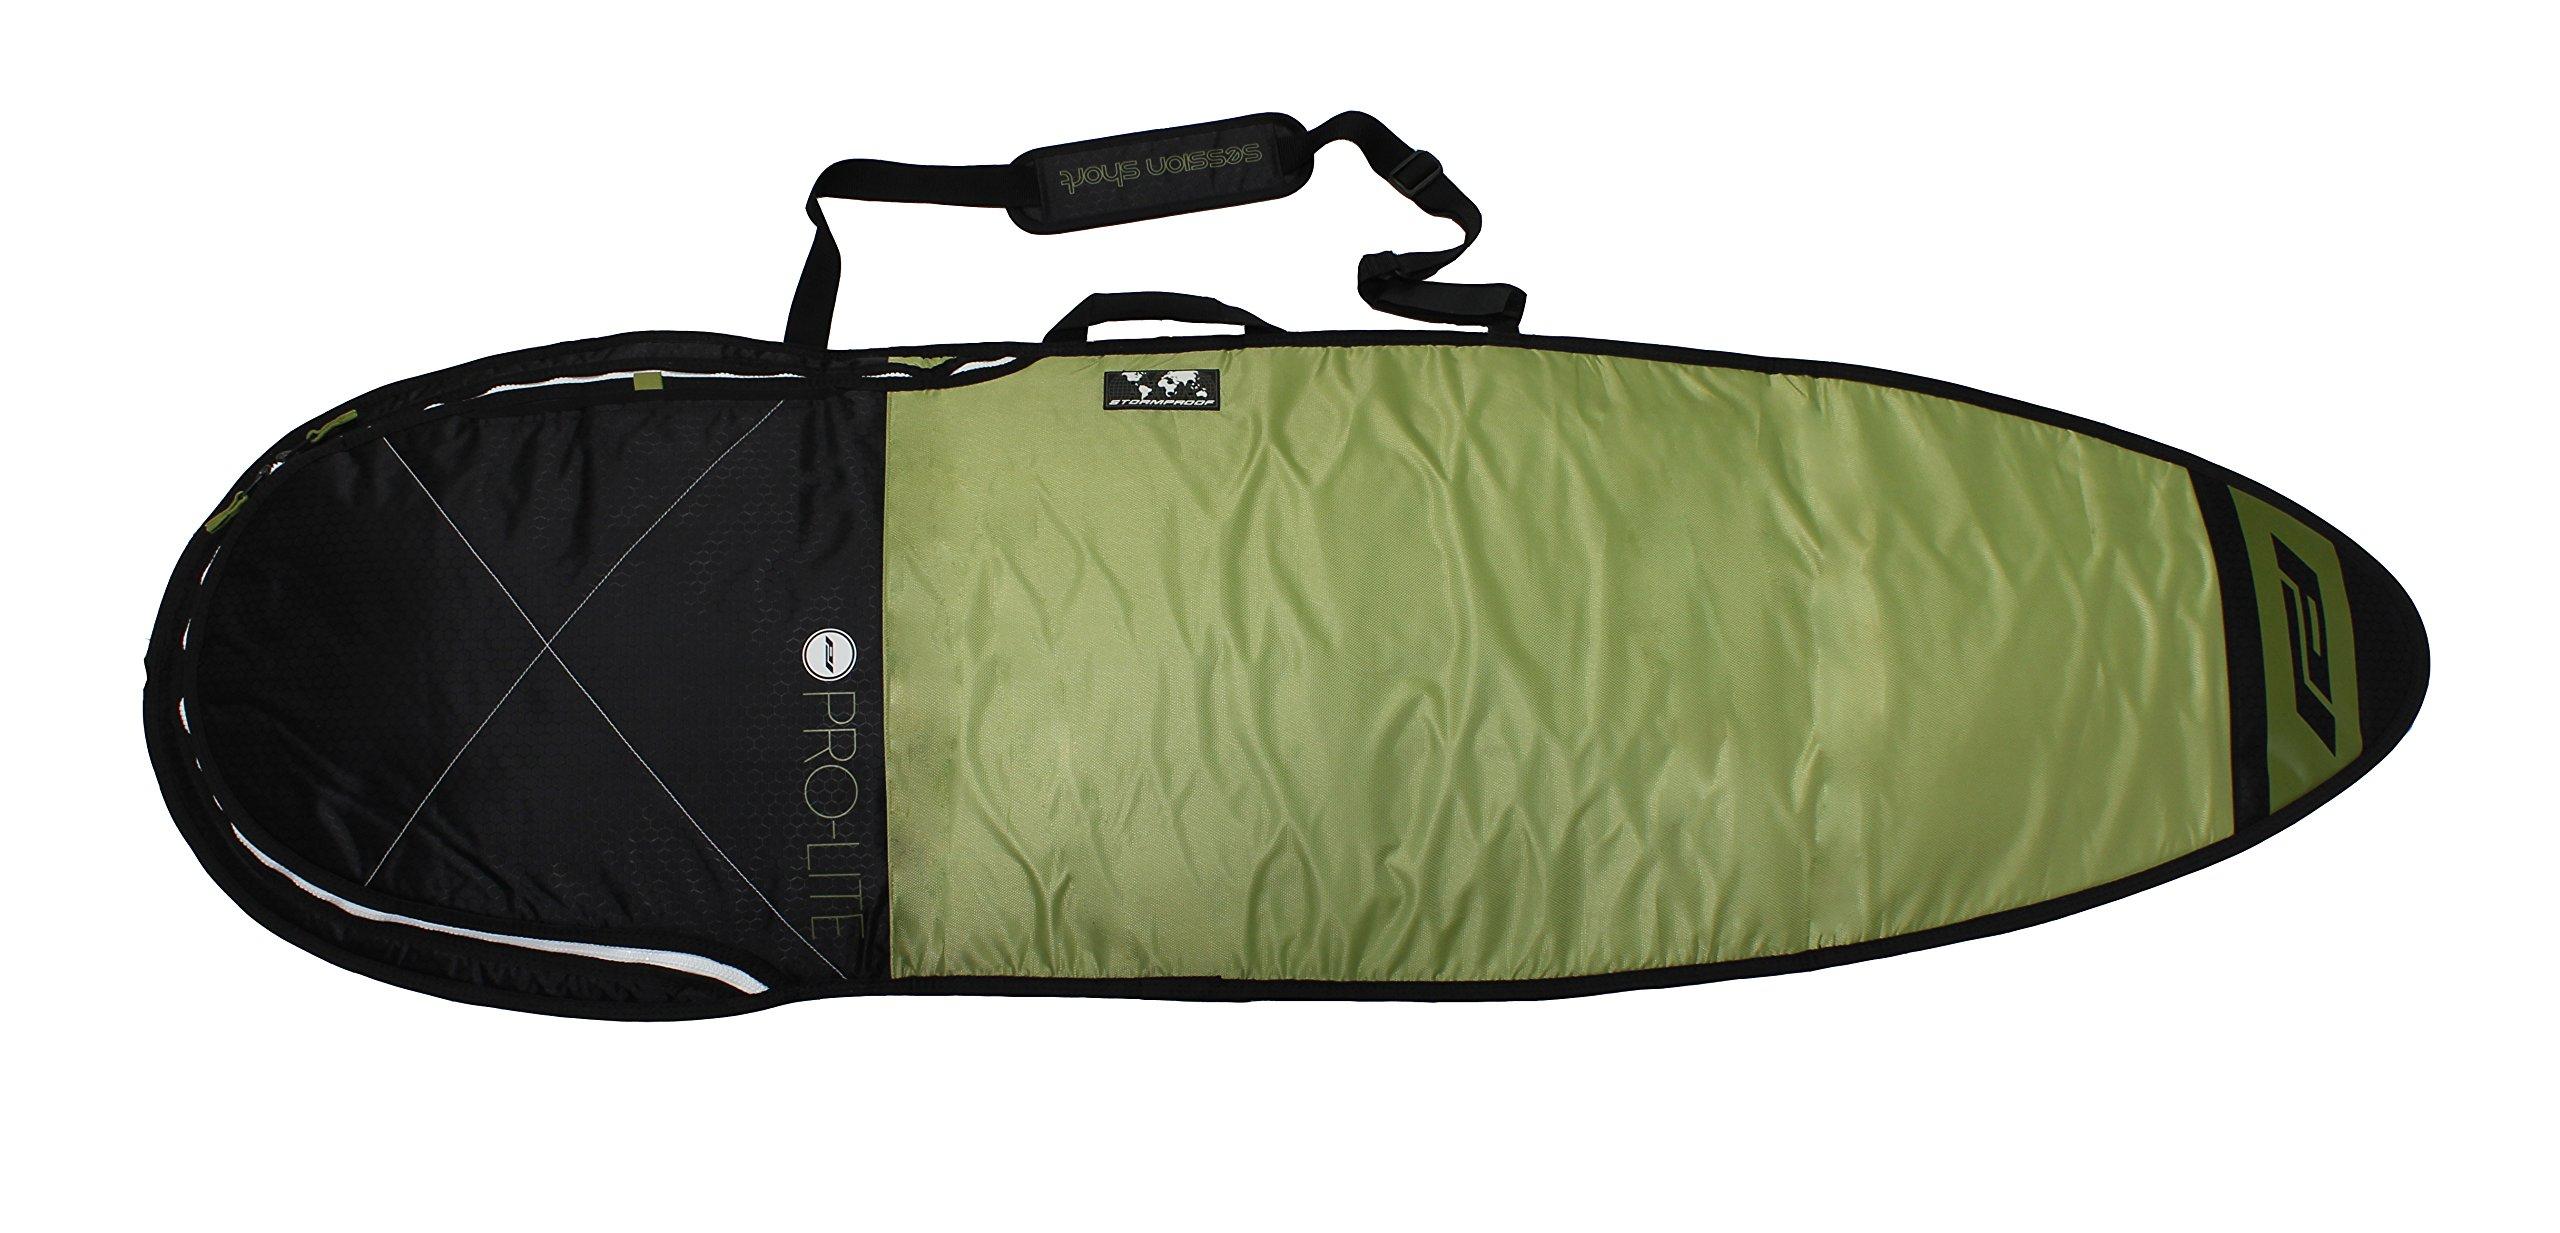 Pro-Lite Session Shortboard Day Bag 6'0 by Pro-Lite